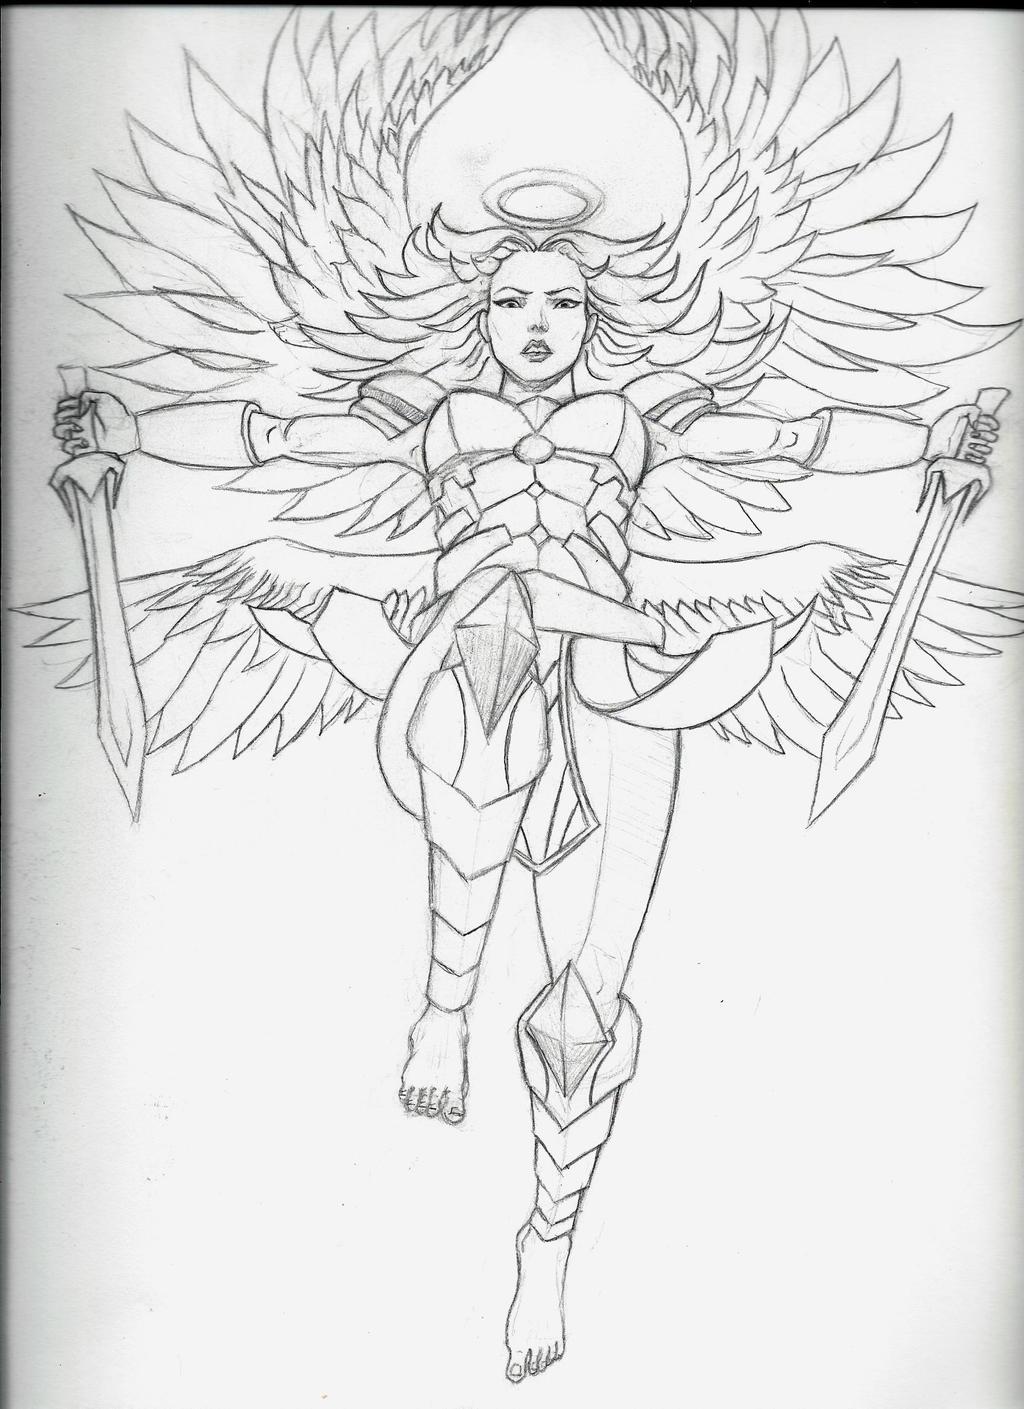 Angel warrior female by armageddon777 on DeviantArt